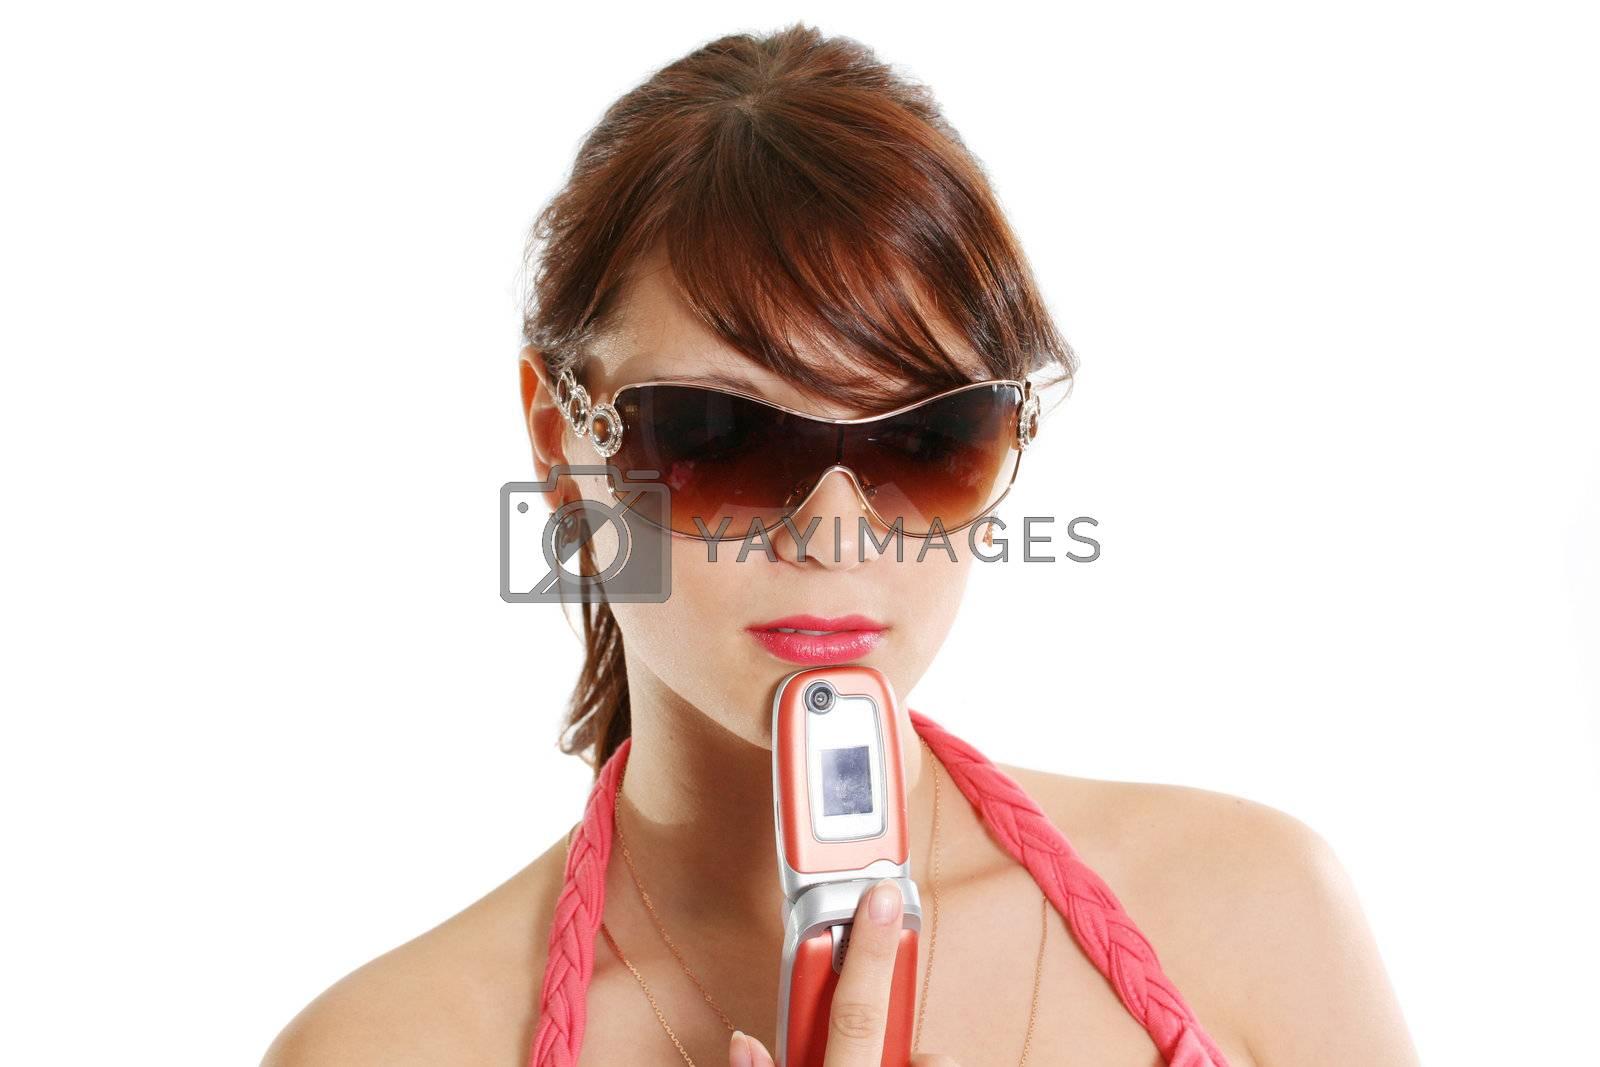 sunglasses adult telephone mobile hair females fashion